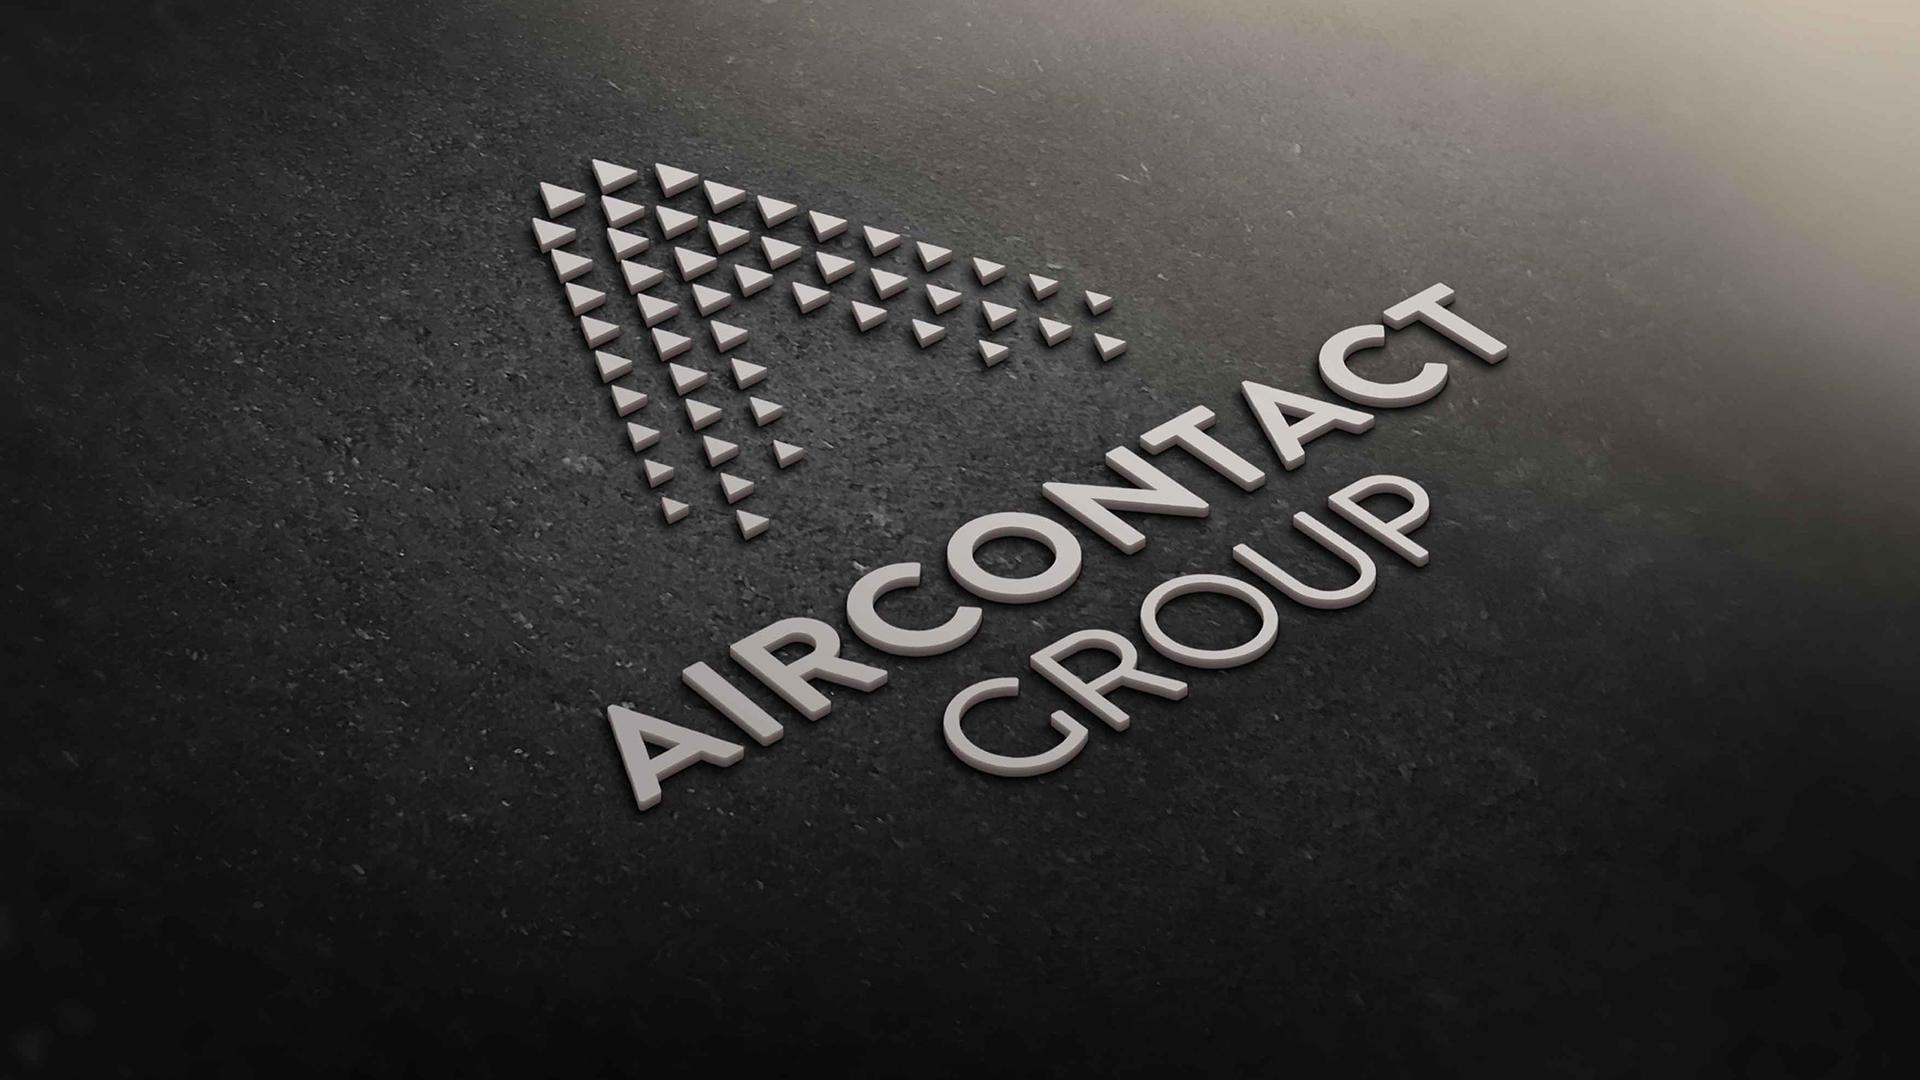 Aircontact Group